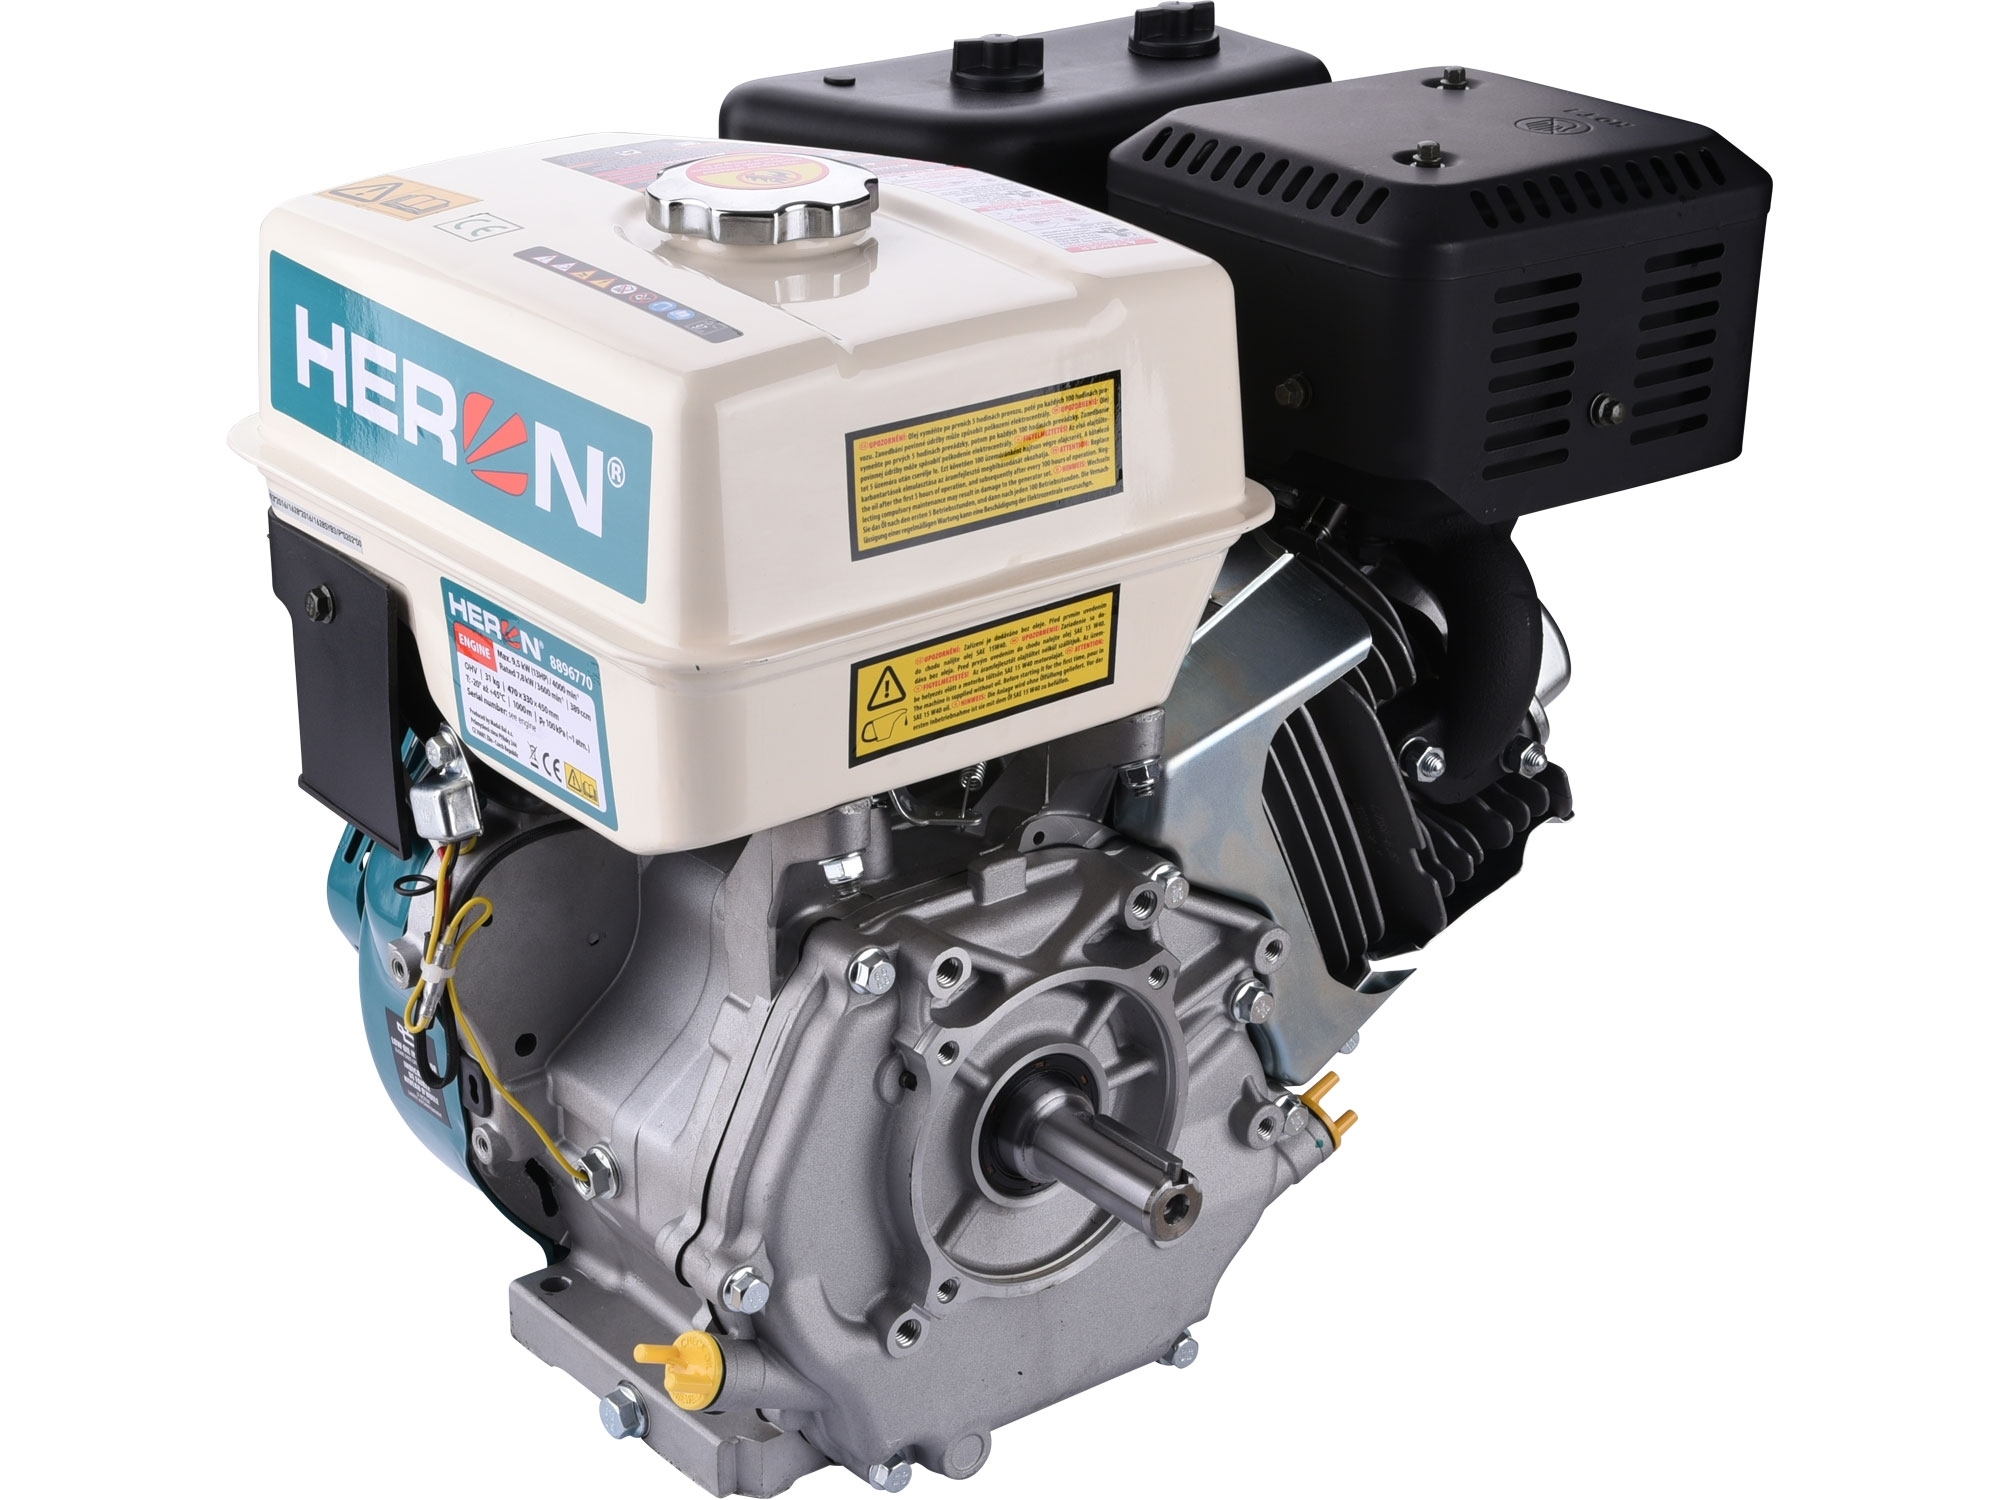 motor samostatný, 389ccm, 13HP, HERON 8896770